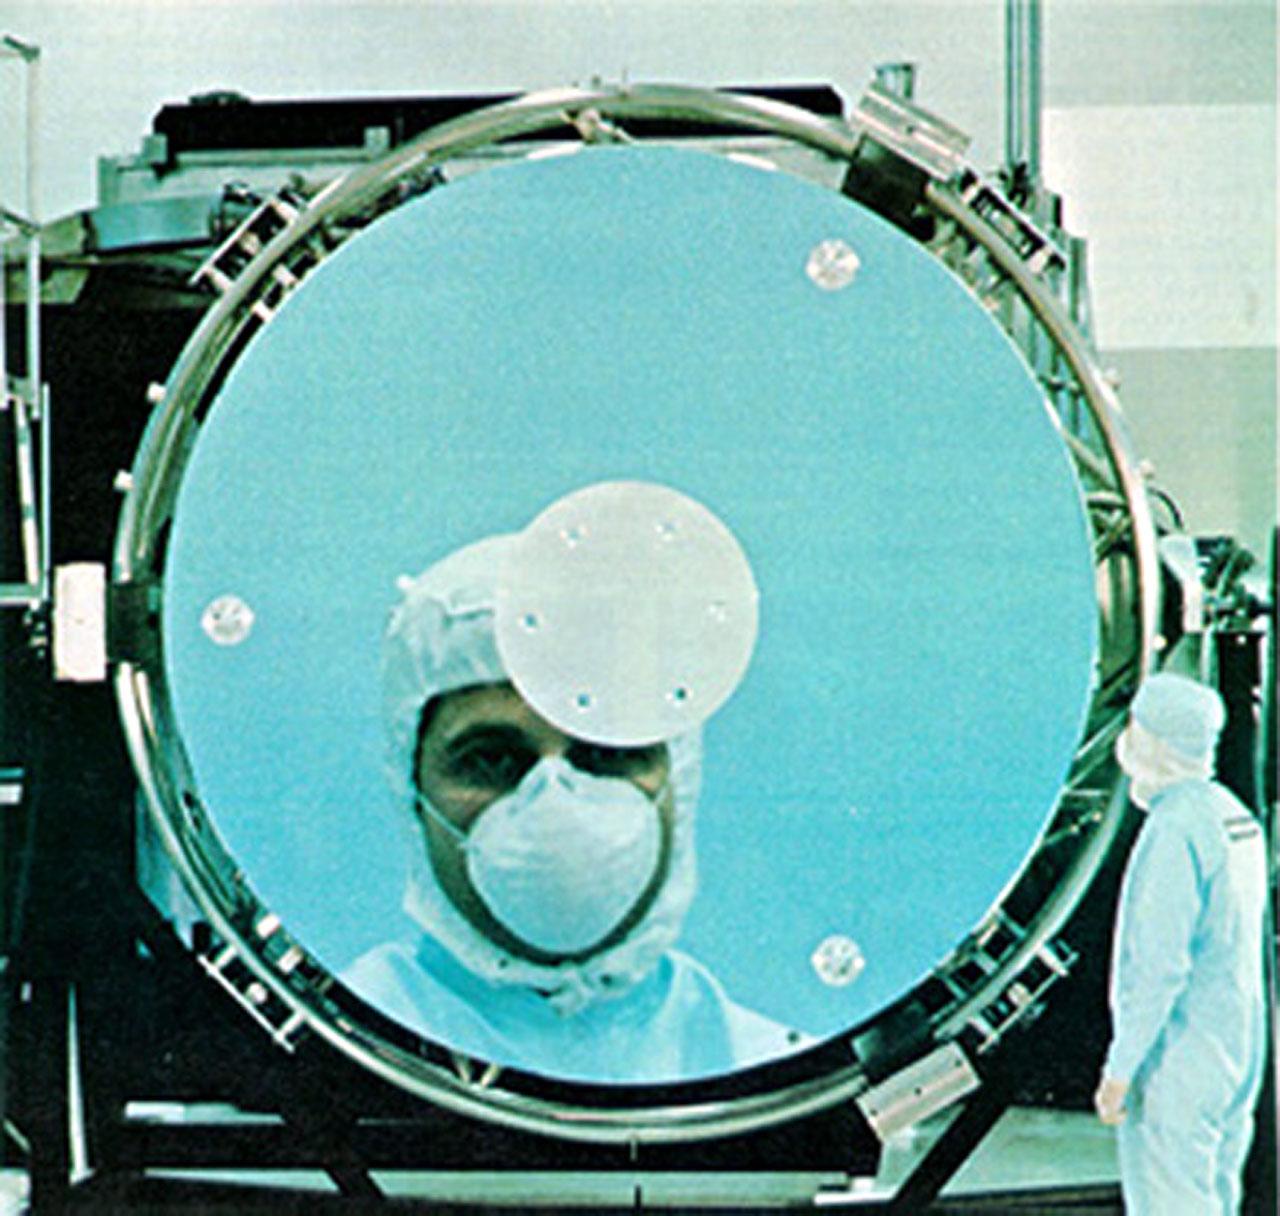 hubble telescope flawed mirrors - photo #18